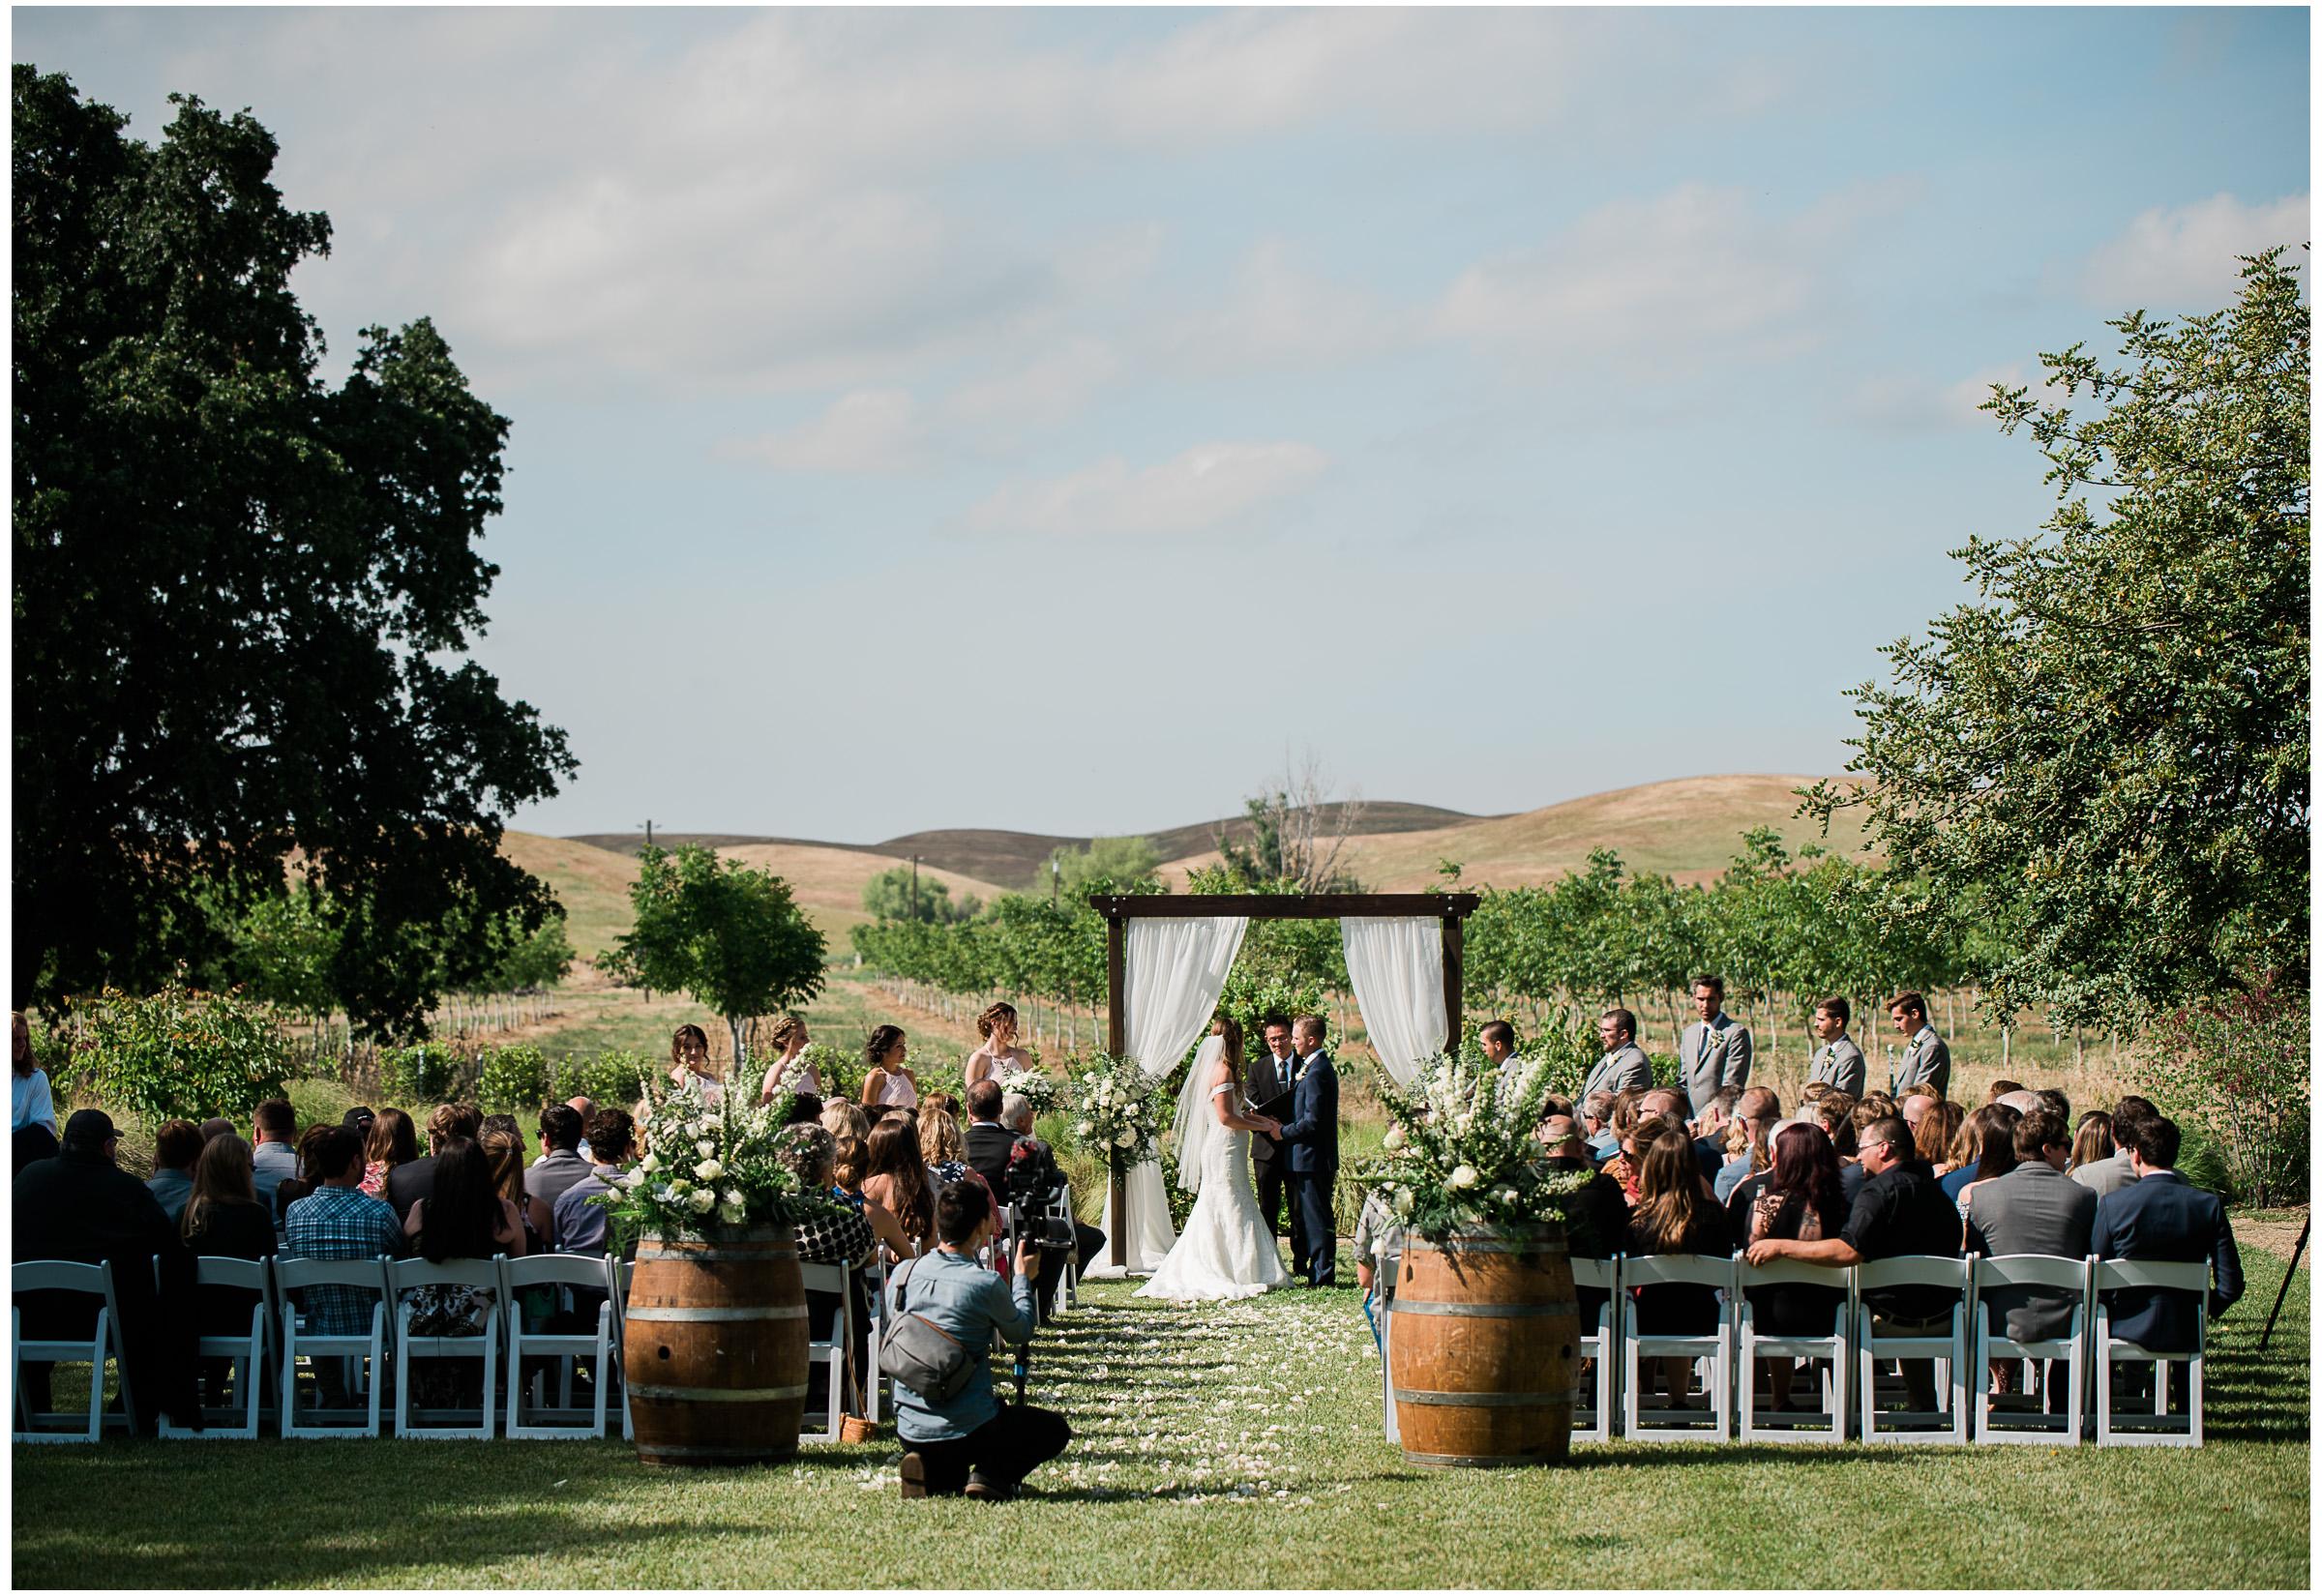 Winters Wedding - Sacramento Photographer - Field & Pond - Justin Wilcox Photography - 27.jpg